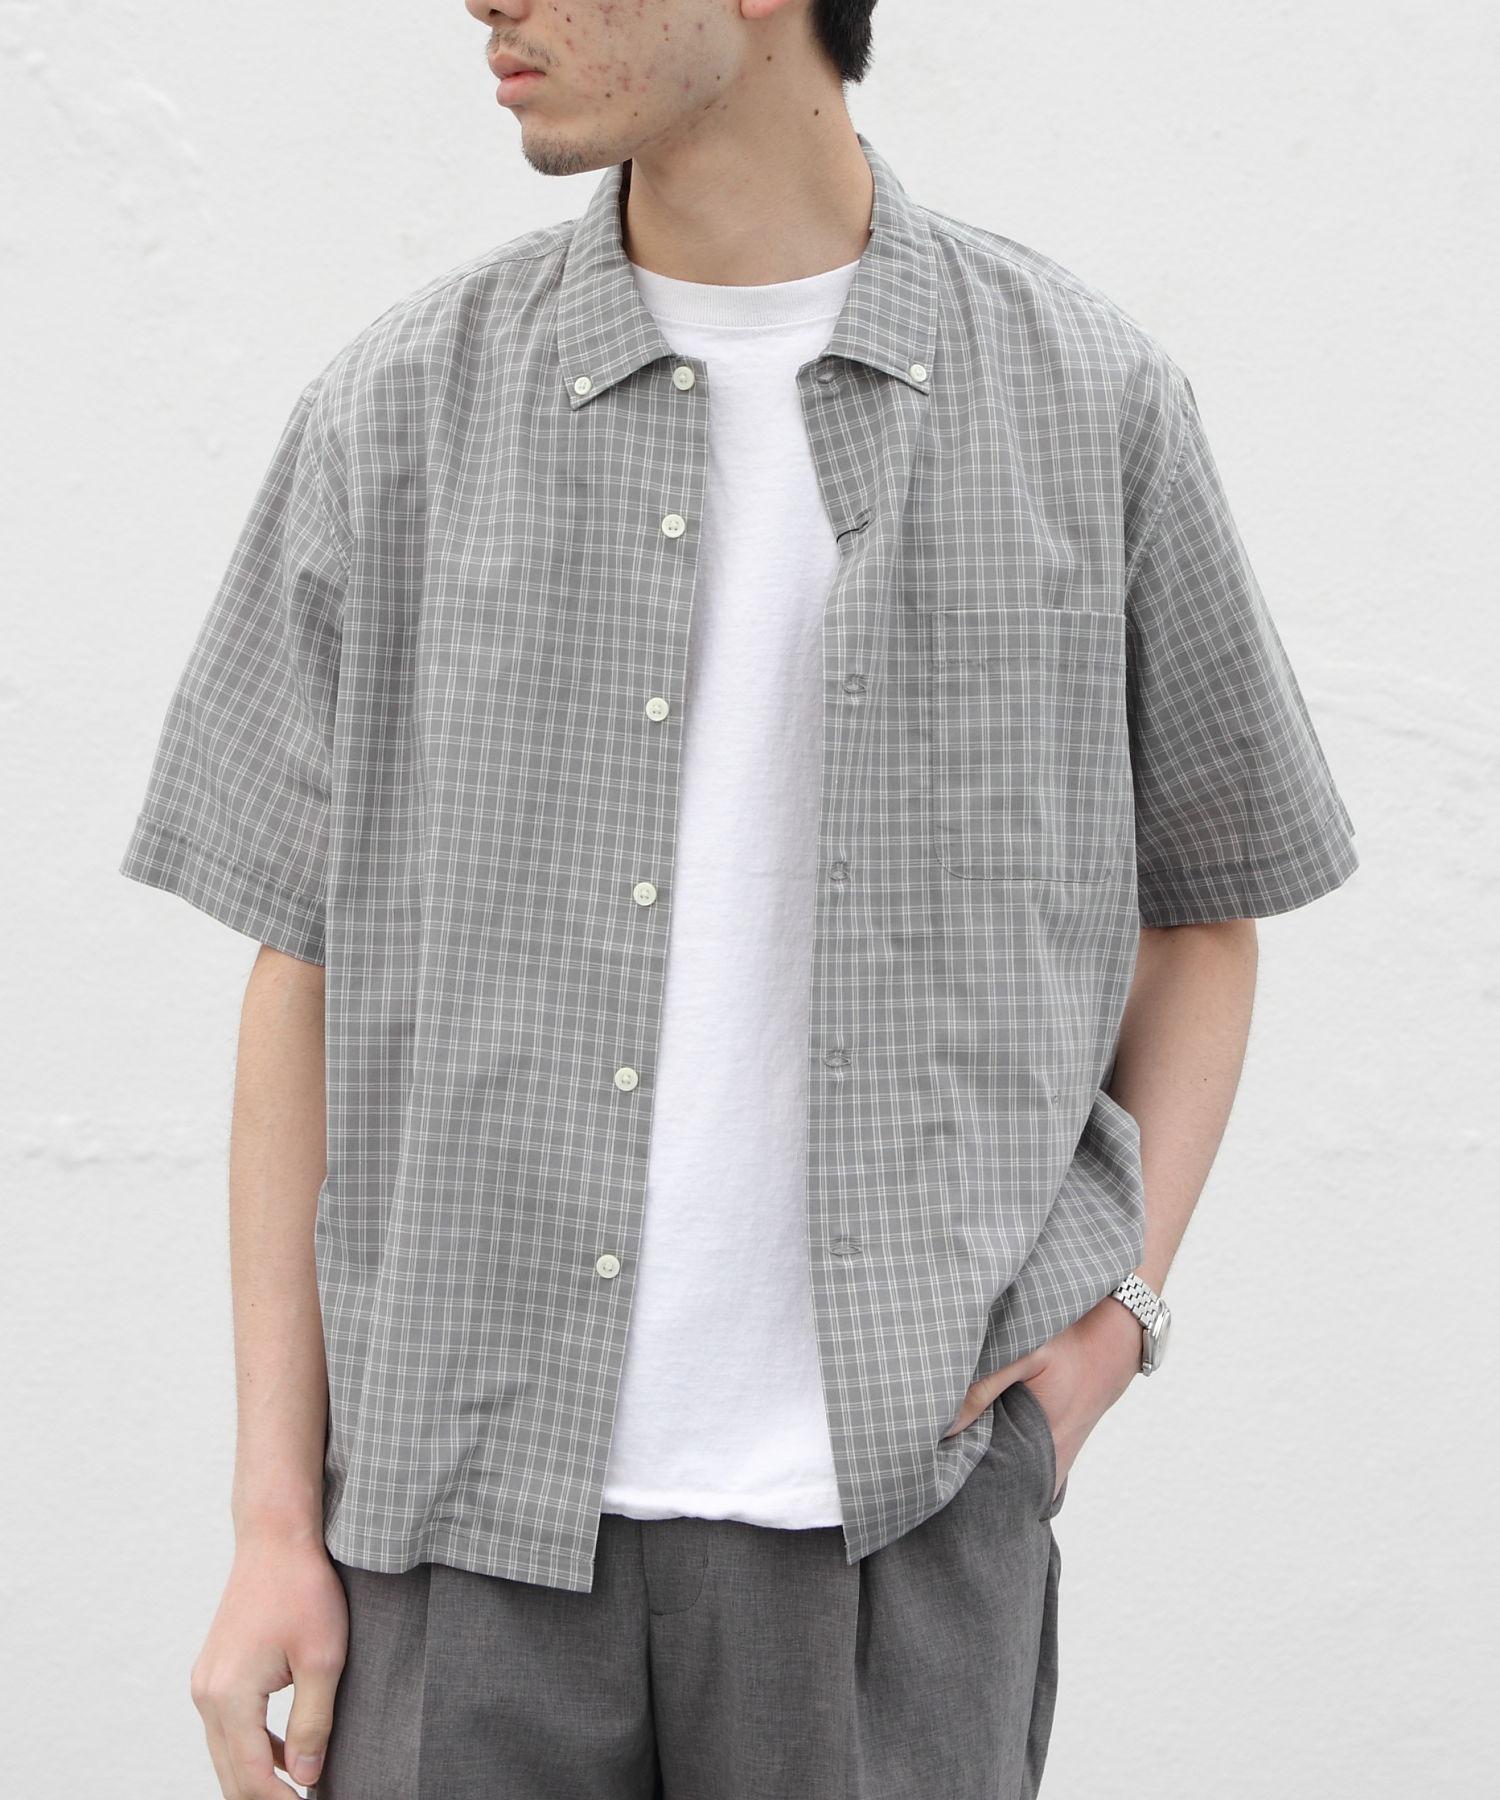 GYMPHLEX/ジムフレックス チェックシャツショートスリーブ T/C CHECK S/S J-3811